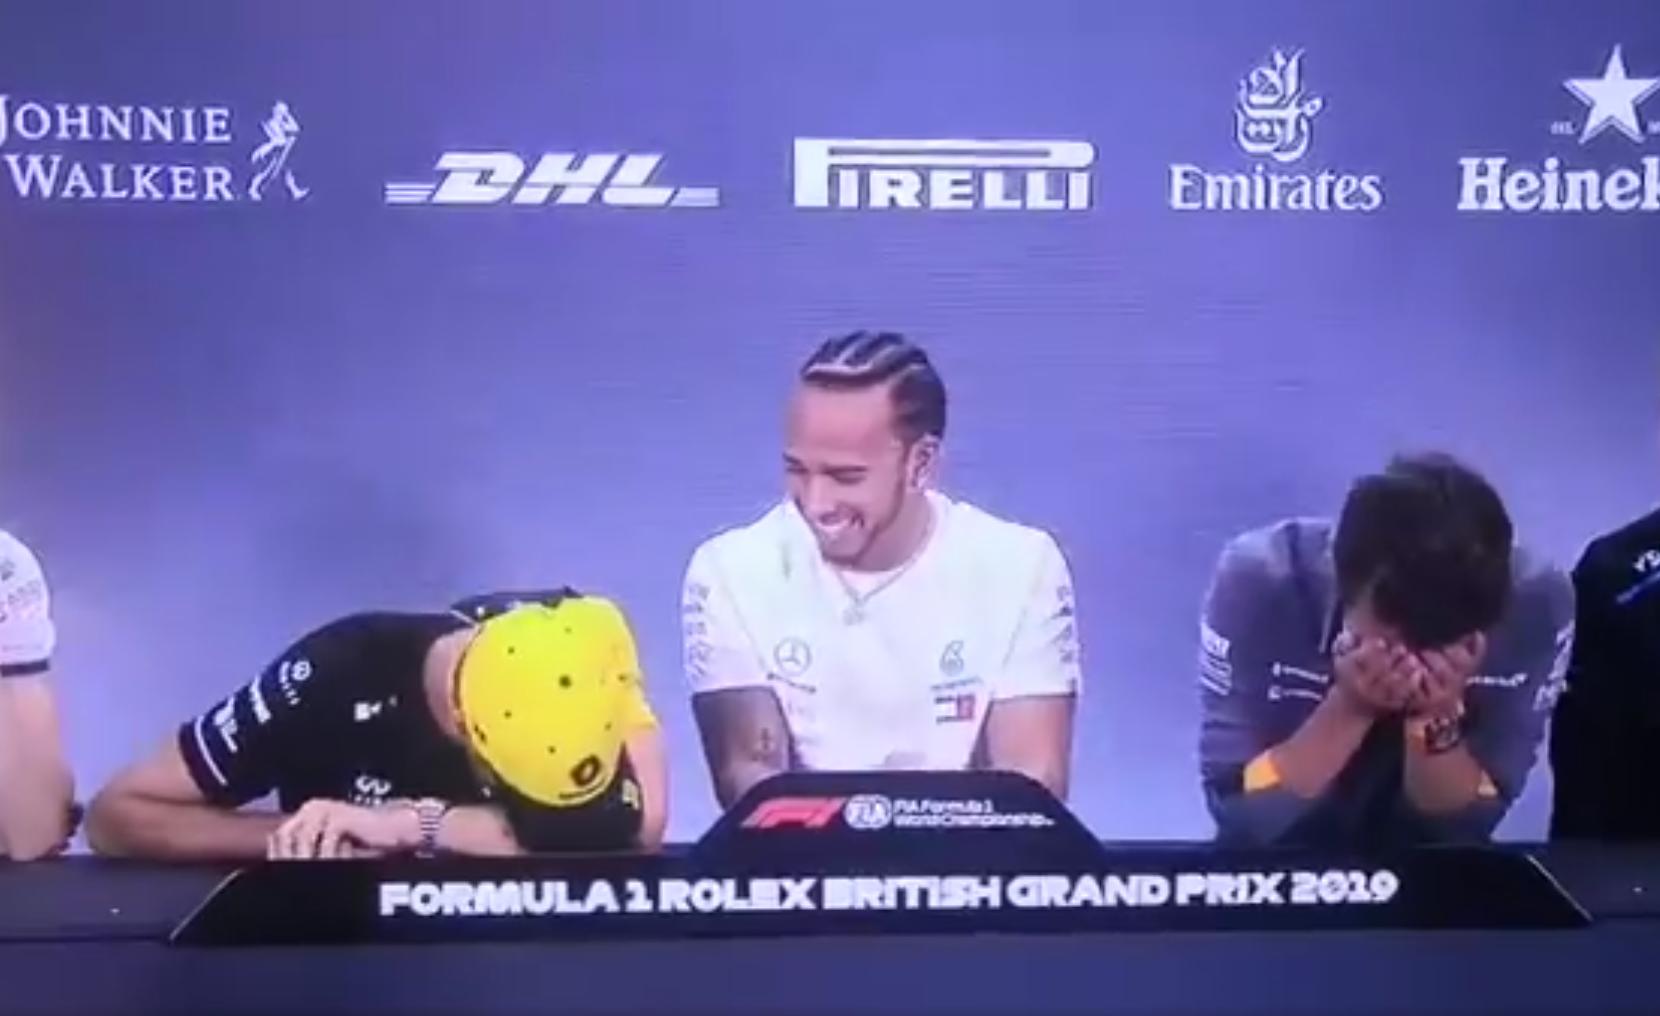 Lando Norris And Daniel Ricciardo Having Fun At Press Conference